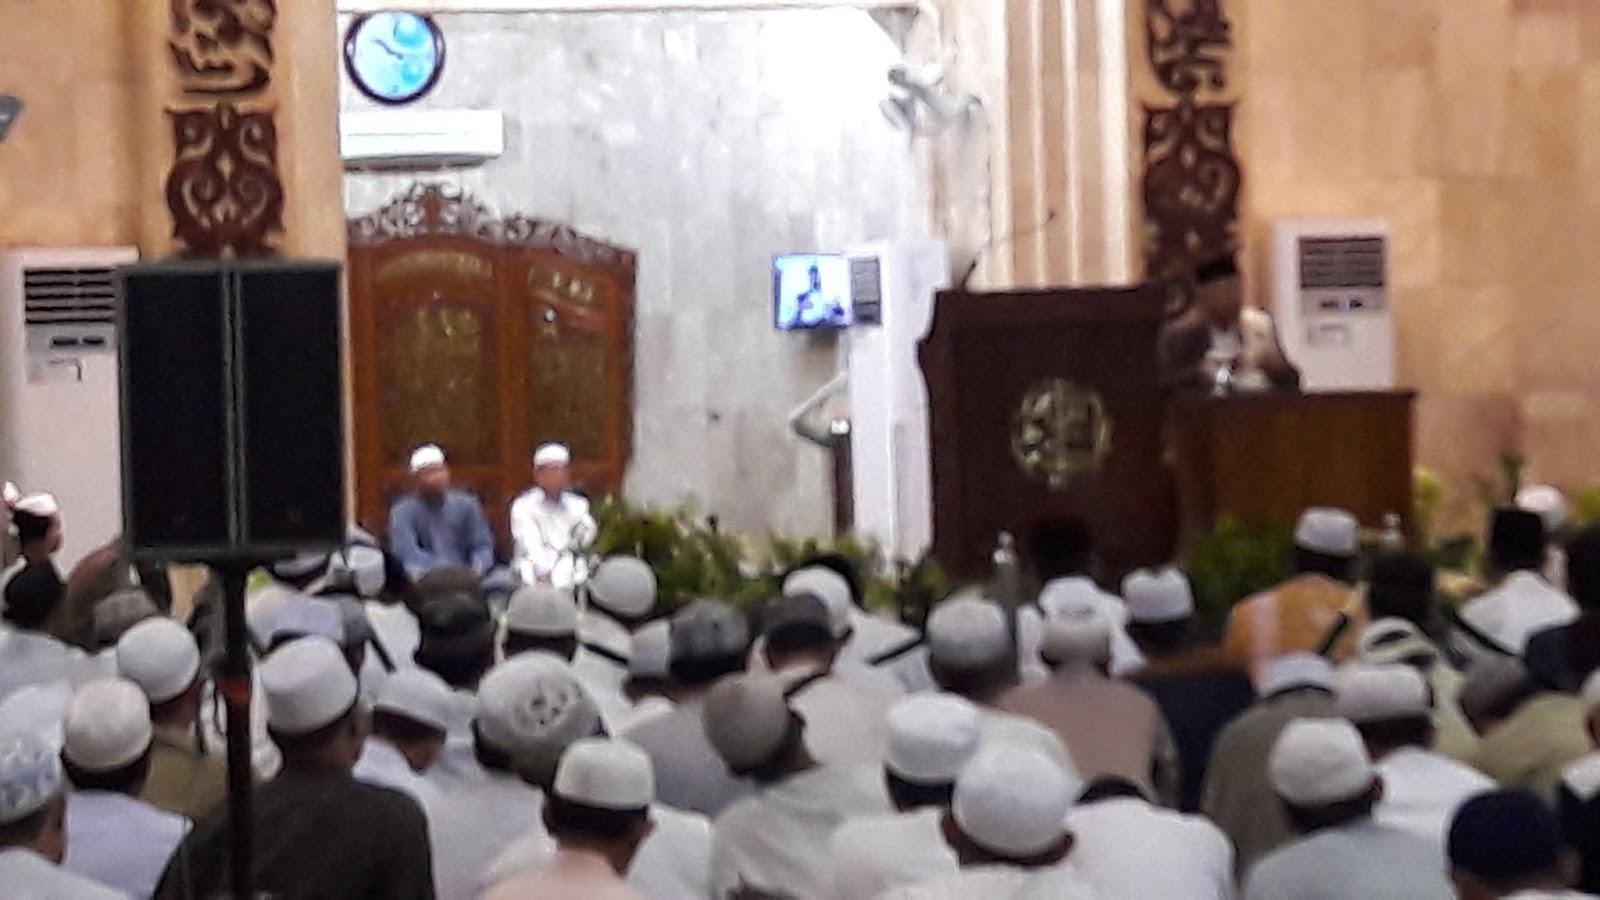 Peringatan Maulid Nabi Sabilal Muhtadin Banjarmasin Masjid Raya Kab